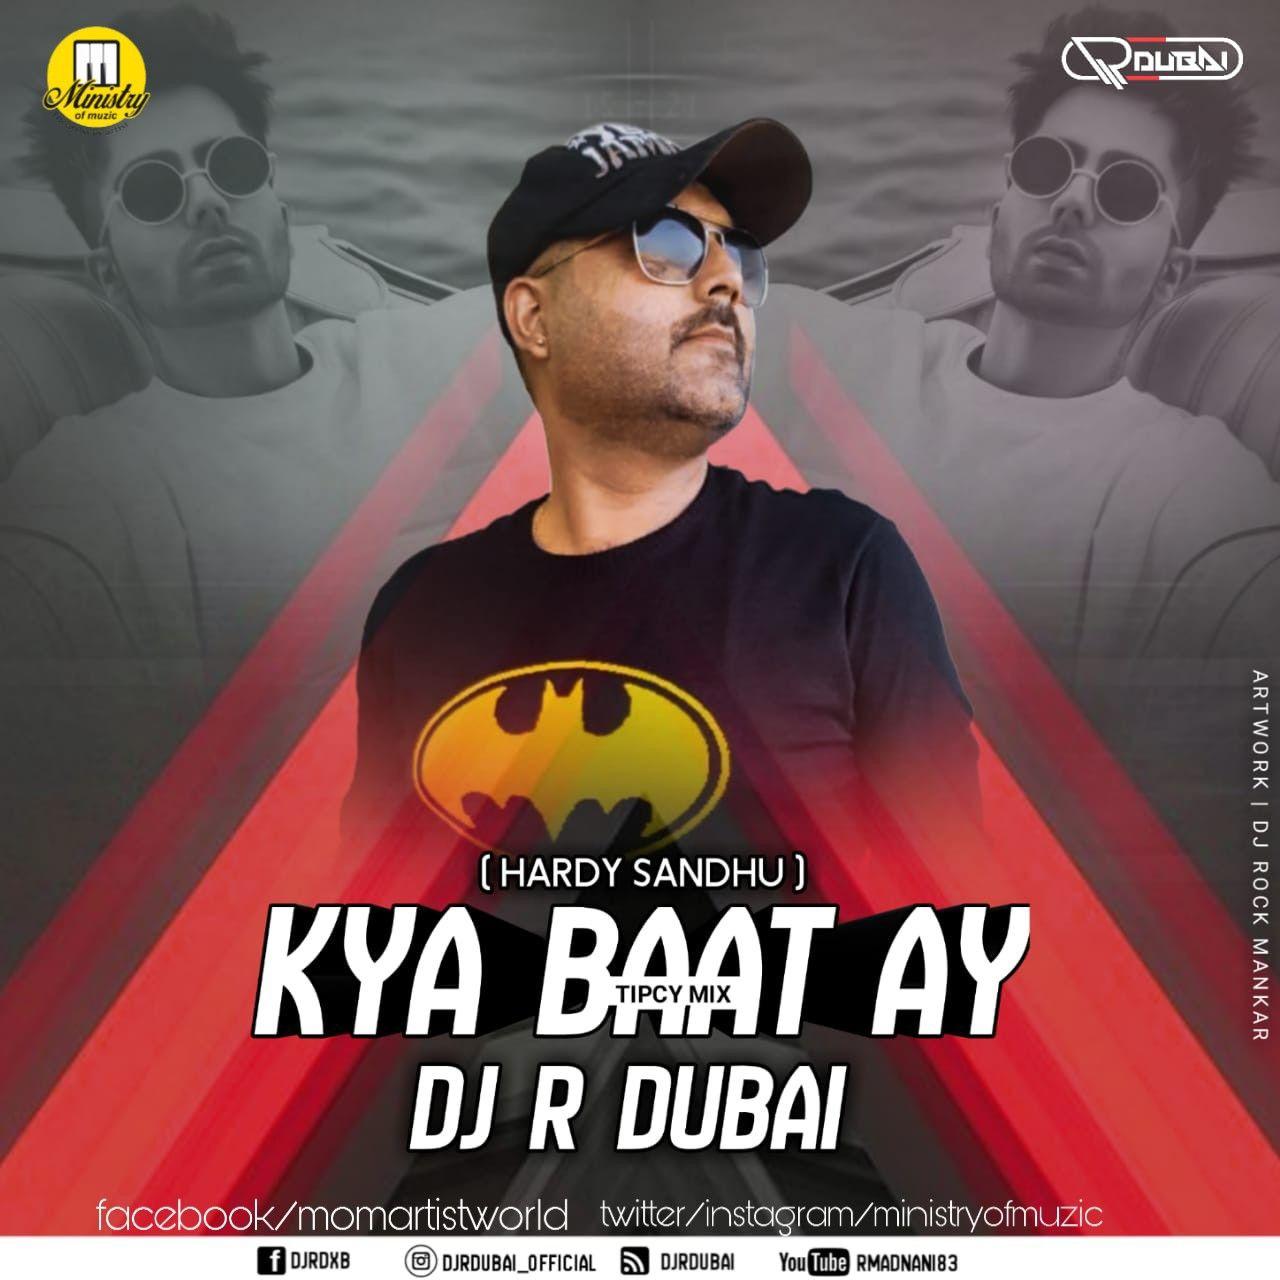 Download Kya Baat Ay Mp3 Song Hardy Sandhu Single Track By Dj R Dubai Https Www Ministryofmuzic Com Kya Baat Ay By Dj R Dubai Mixing Dj Dj Music